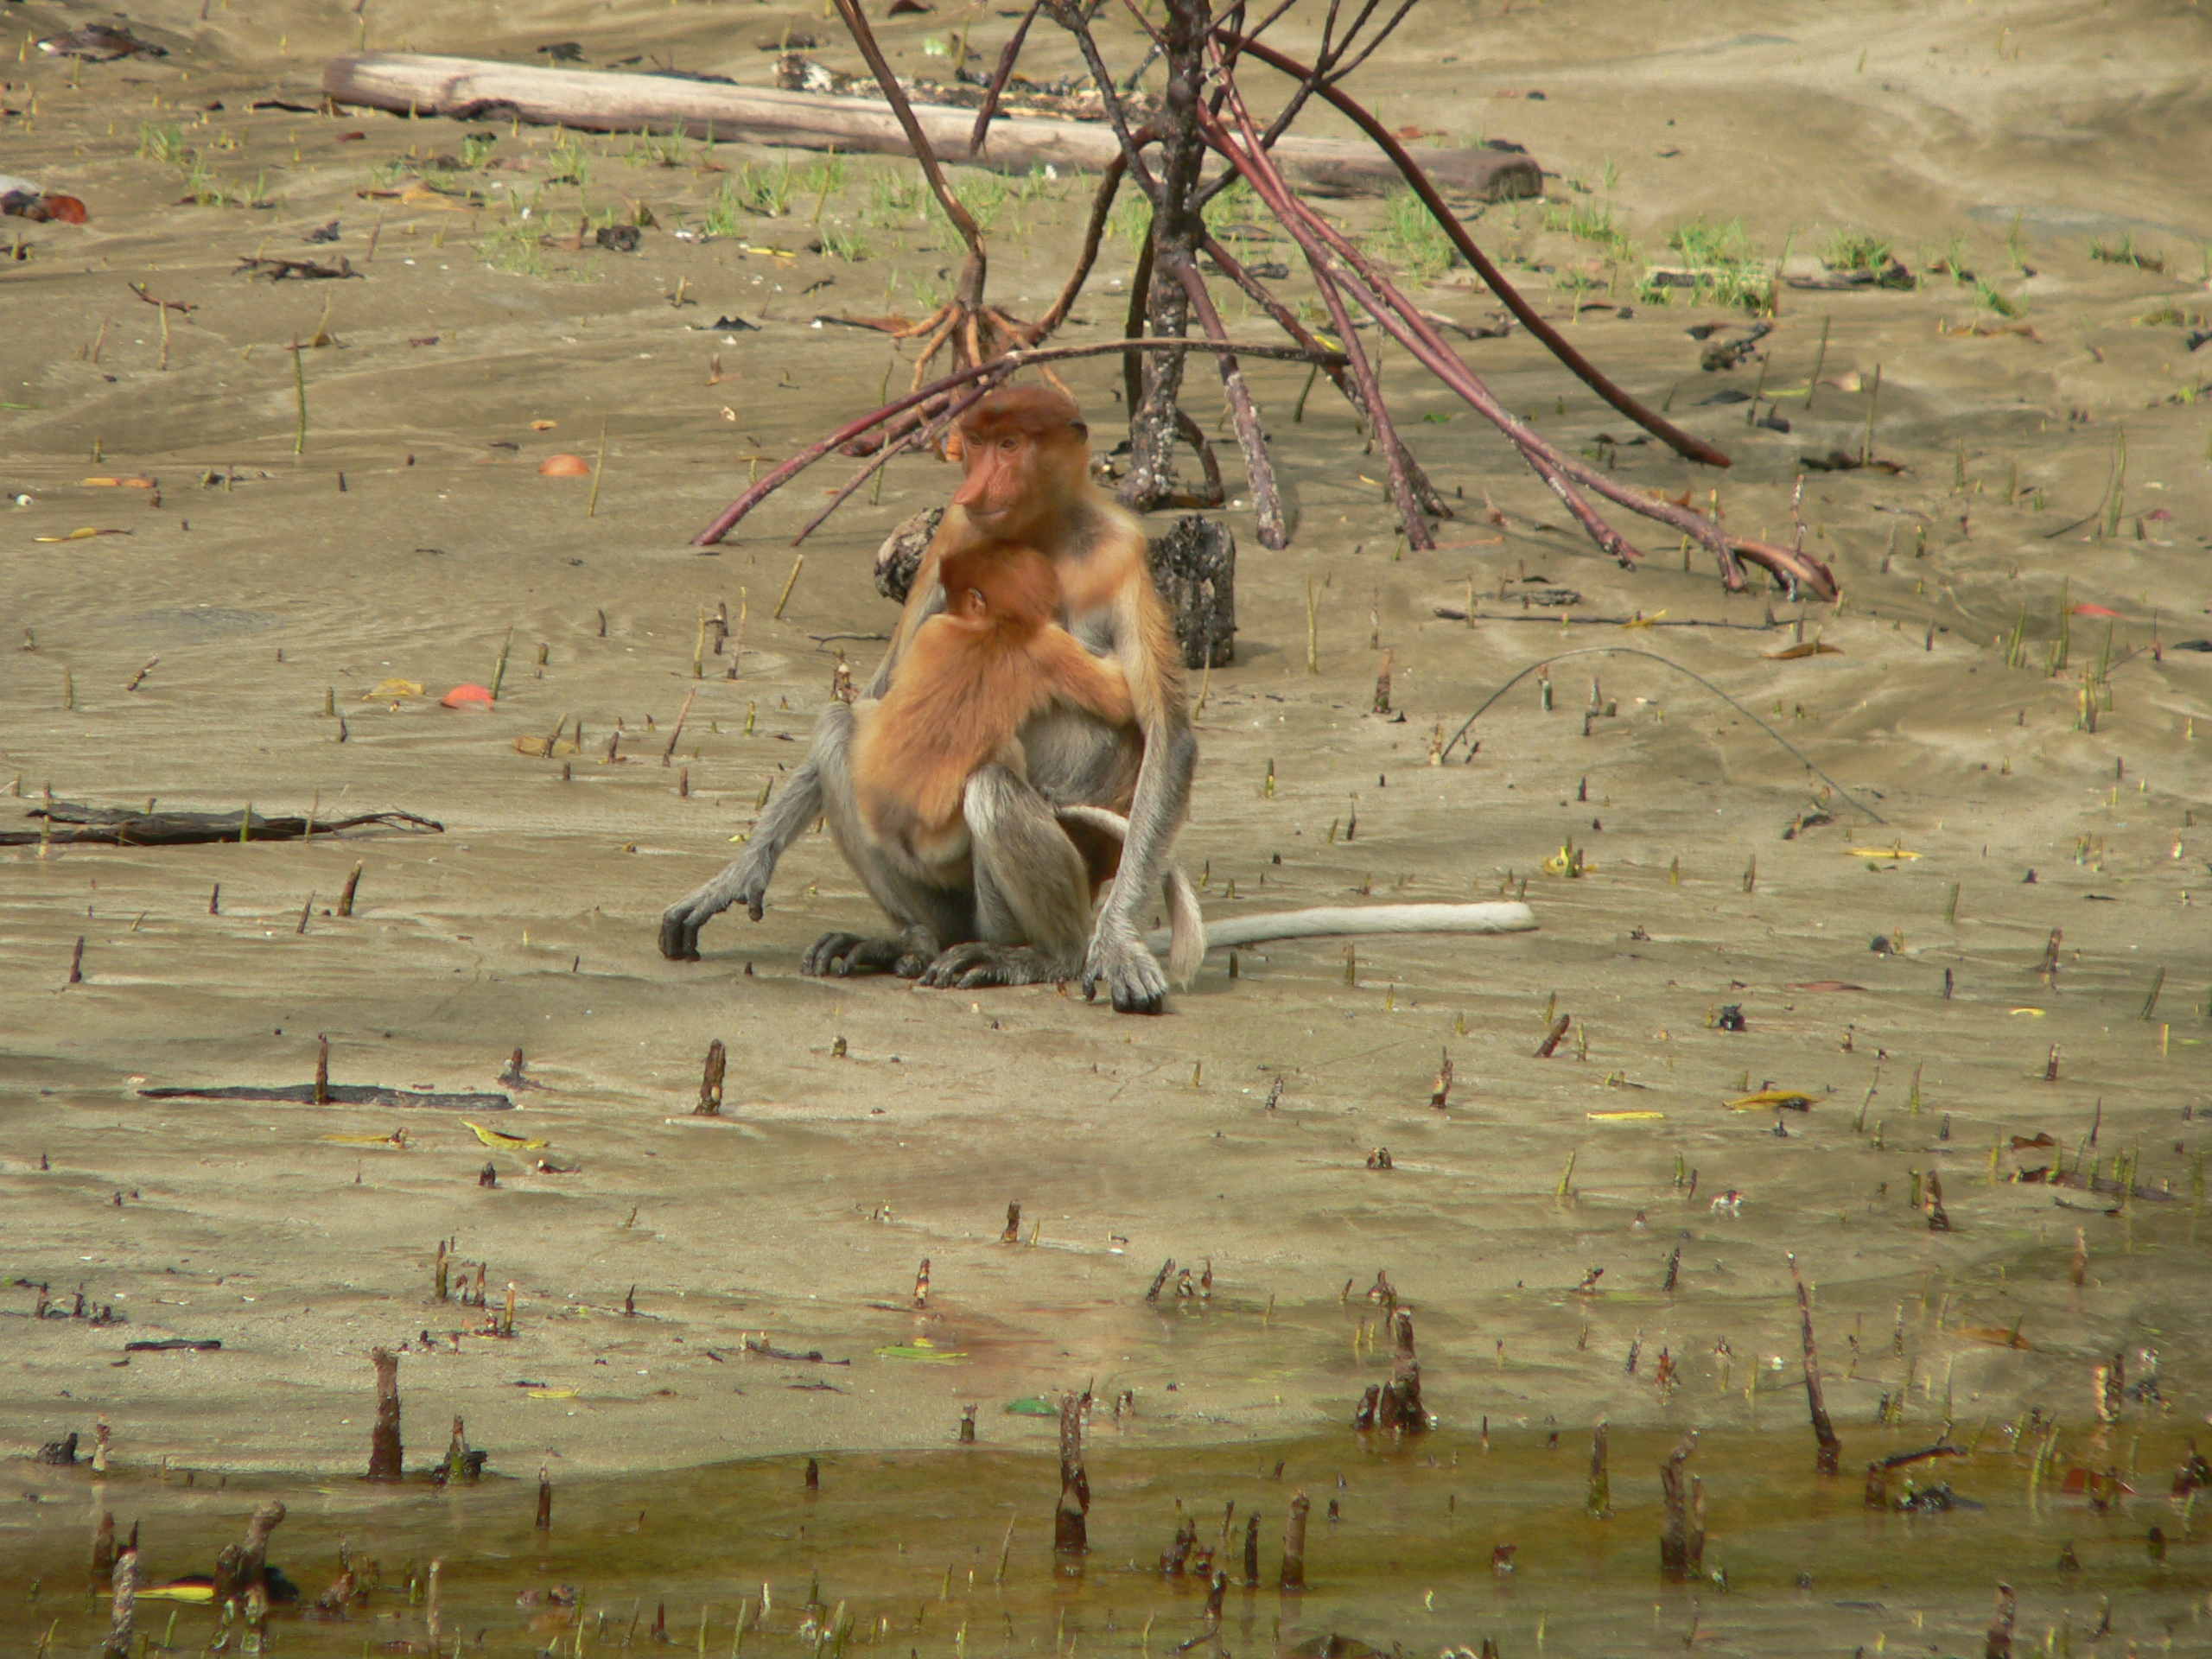 Kahau nosatý - samice s mládětem - foto Petr Čolas